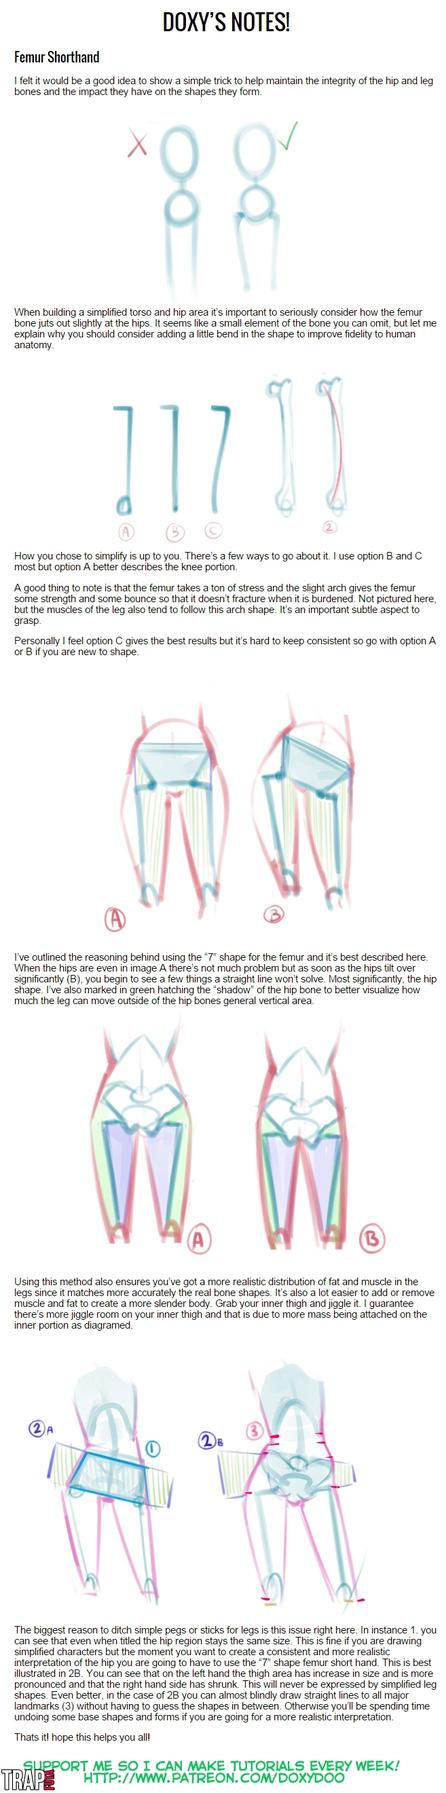 Femur Shorthand by mldoxy